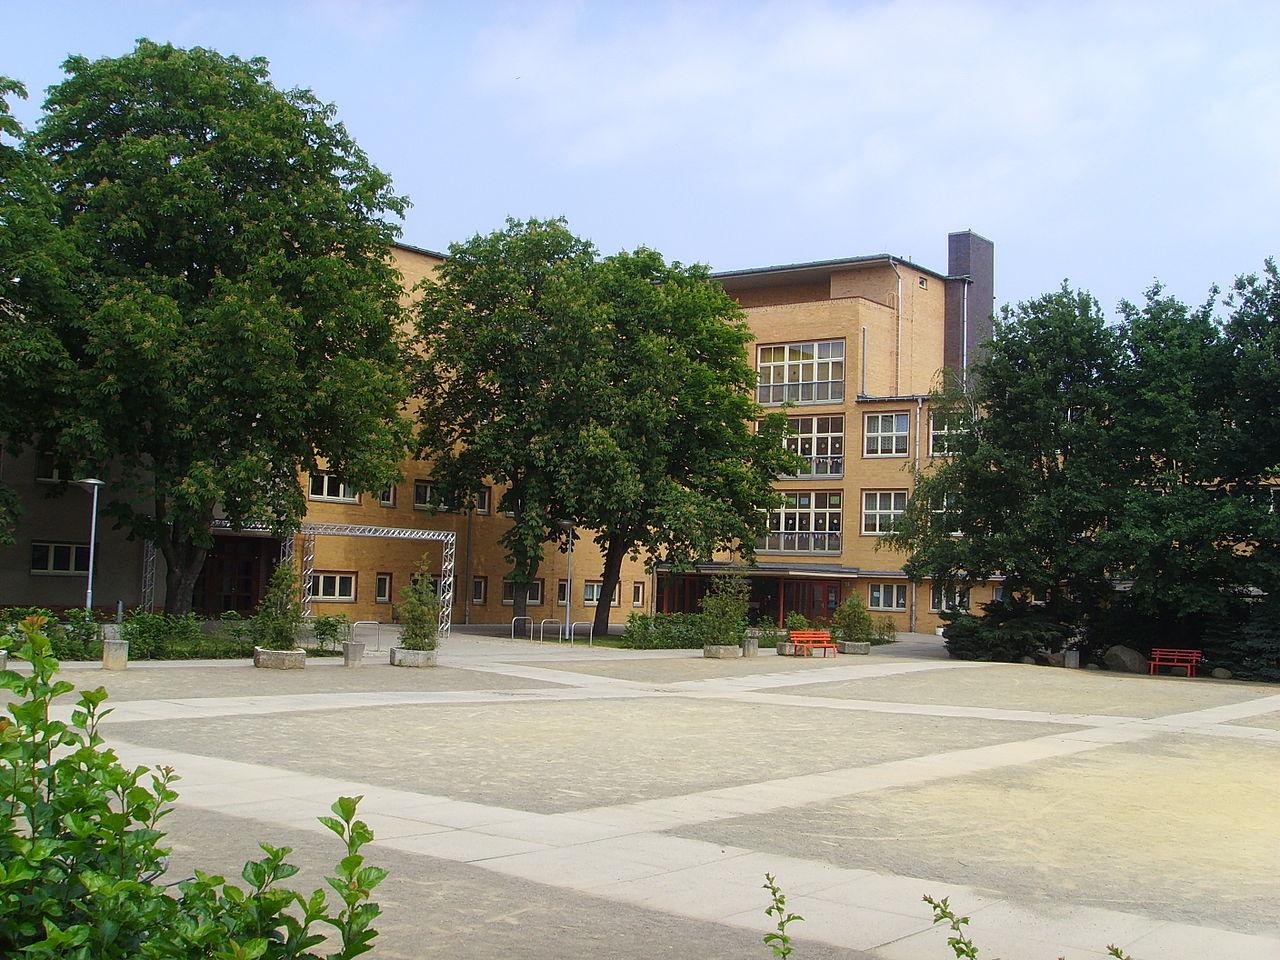 Bild Walther Rathenau Grundschule Senftenberg